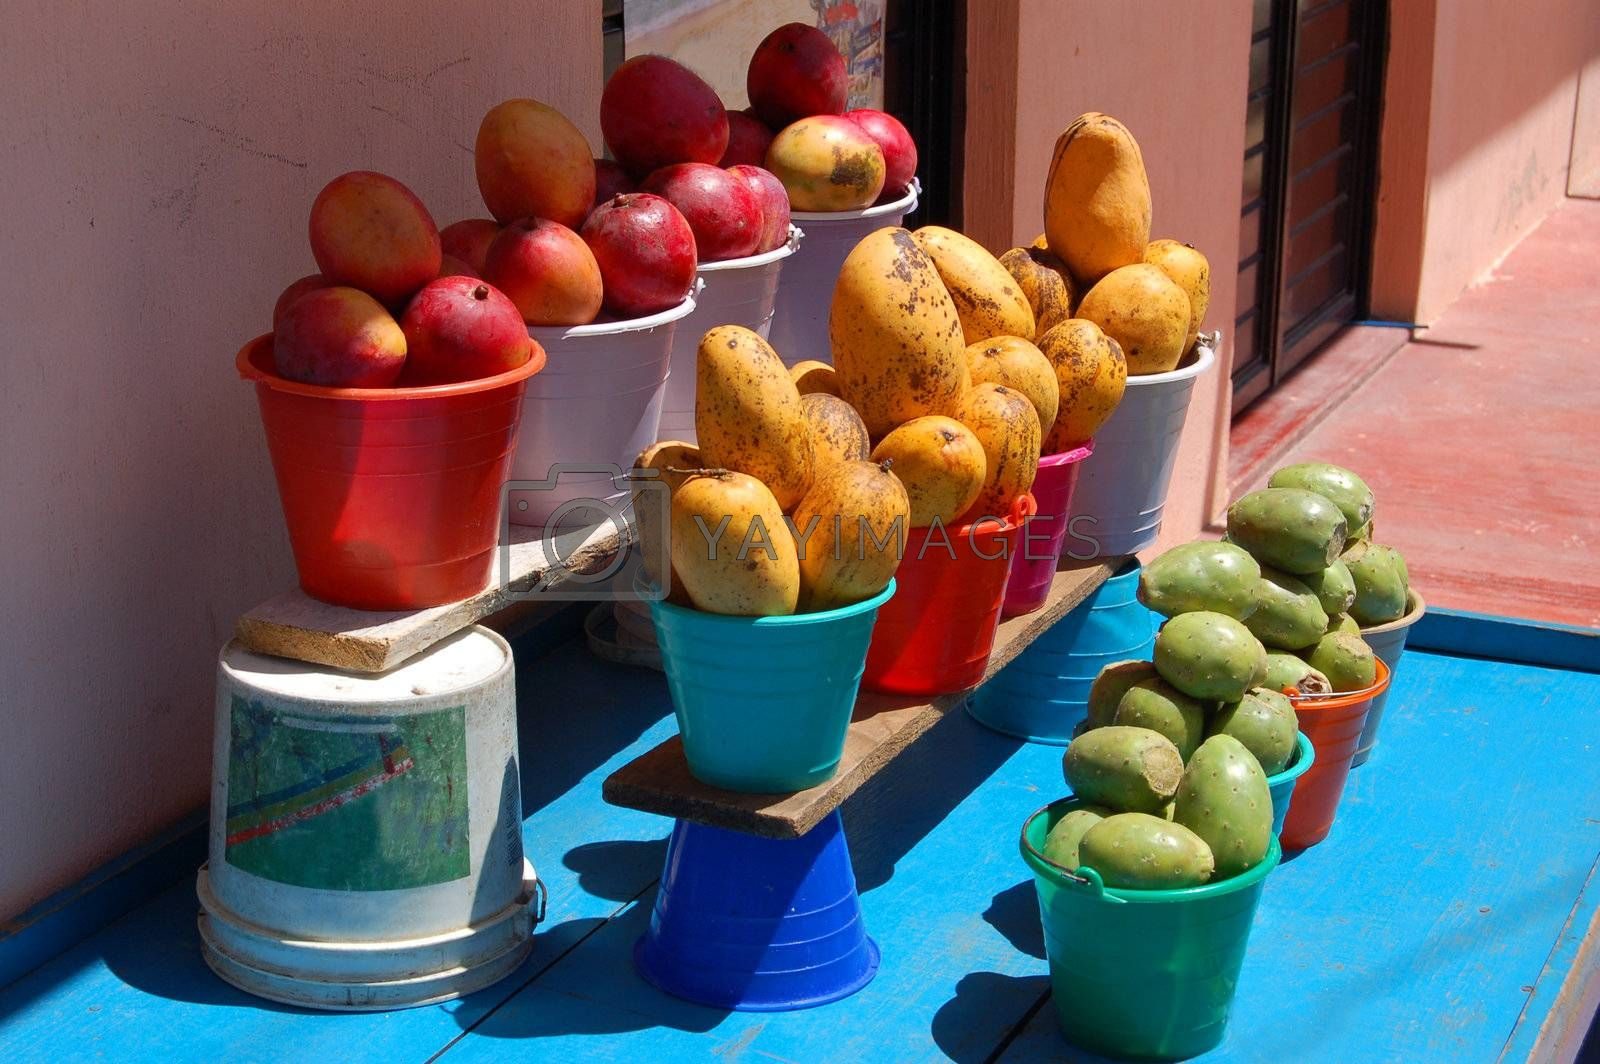 Fruitstand by jorgeinthewater